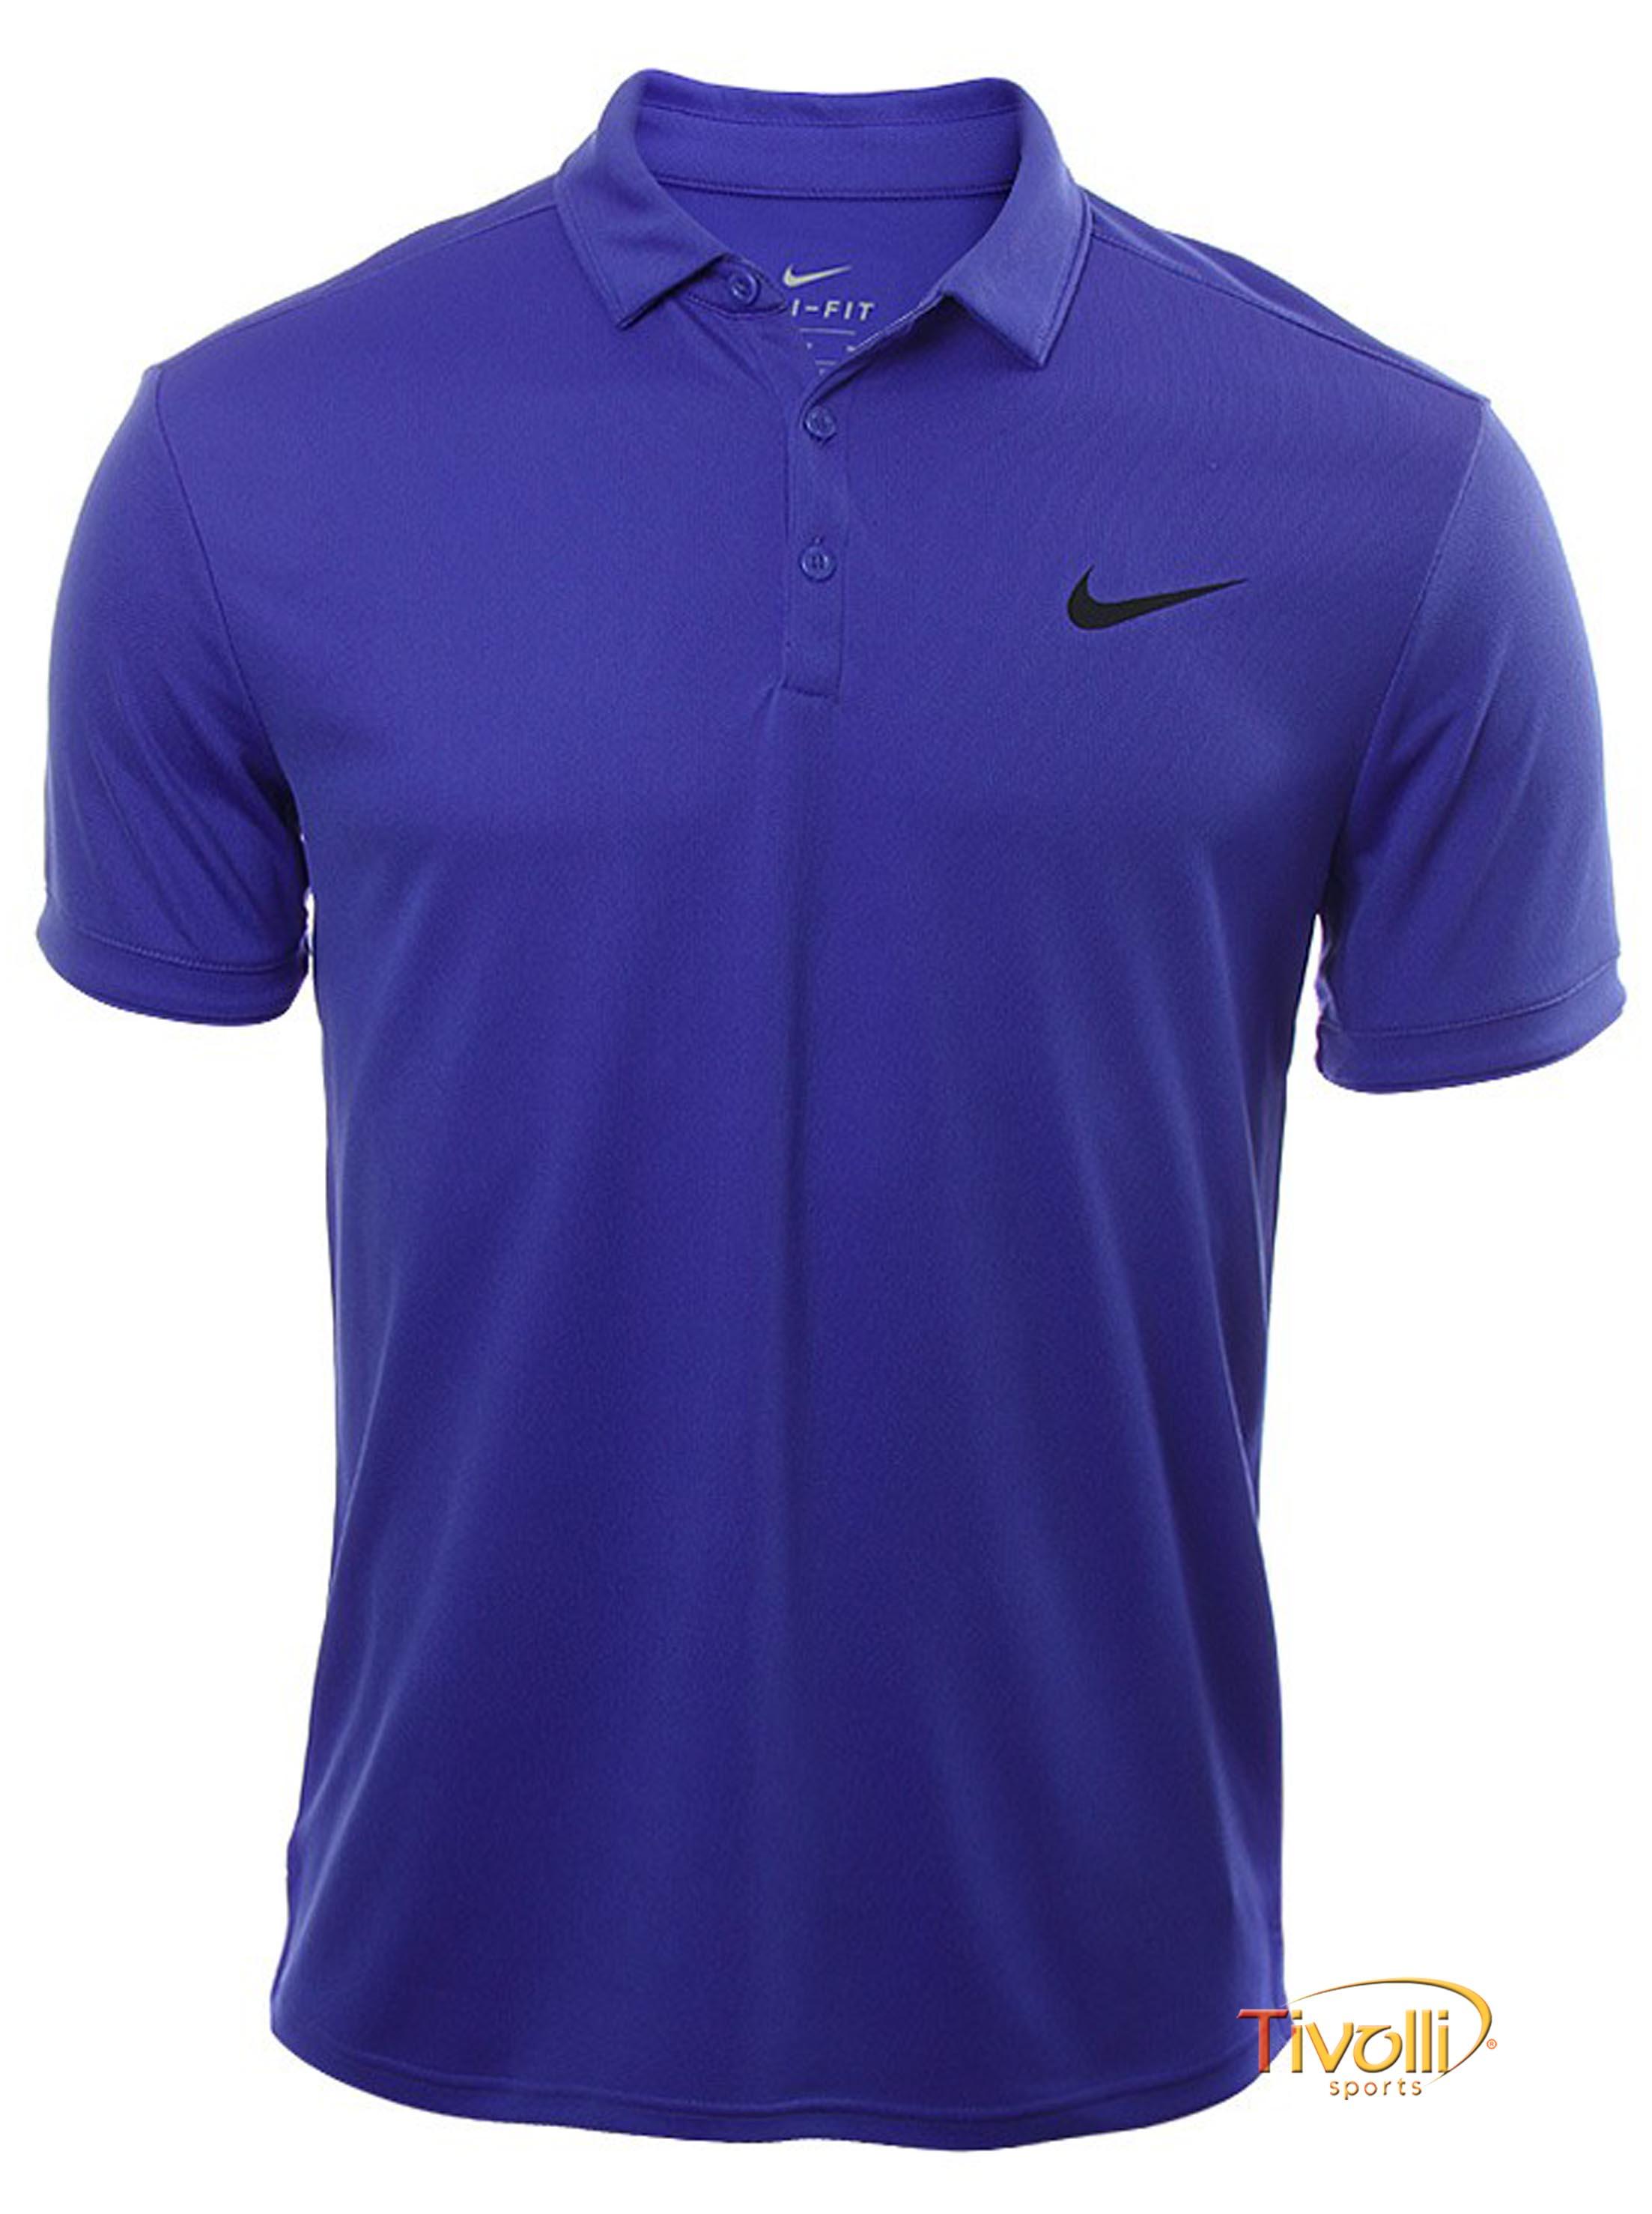 078981f259 Camisa Polo Nike Court Dry   Azul